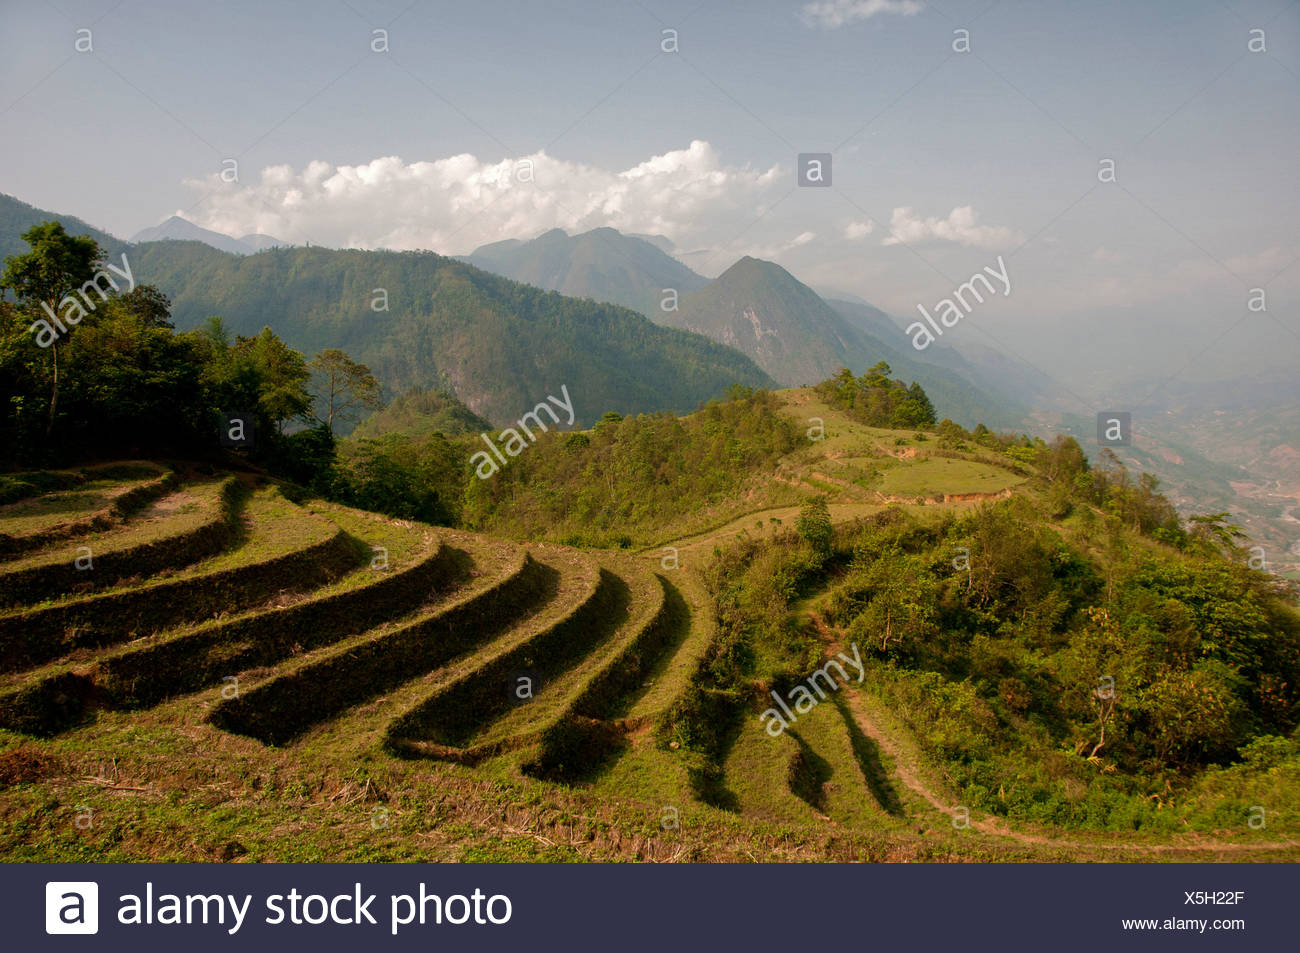 Rice field, terracing, Sapa, Northern Vietnam, Vietnam, Asia, rice, agriculture, landscape - Stock Image